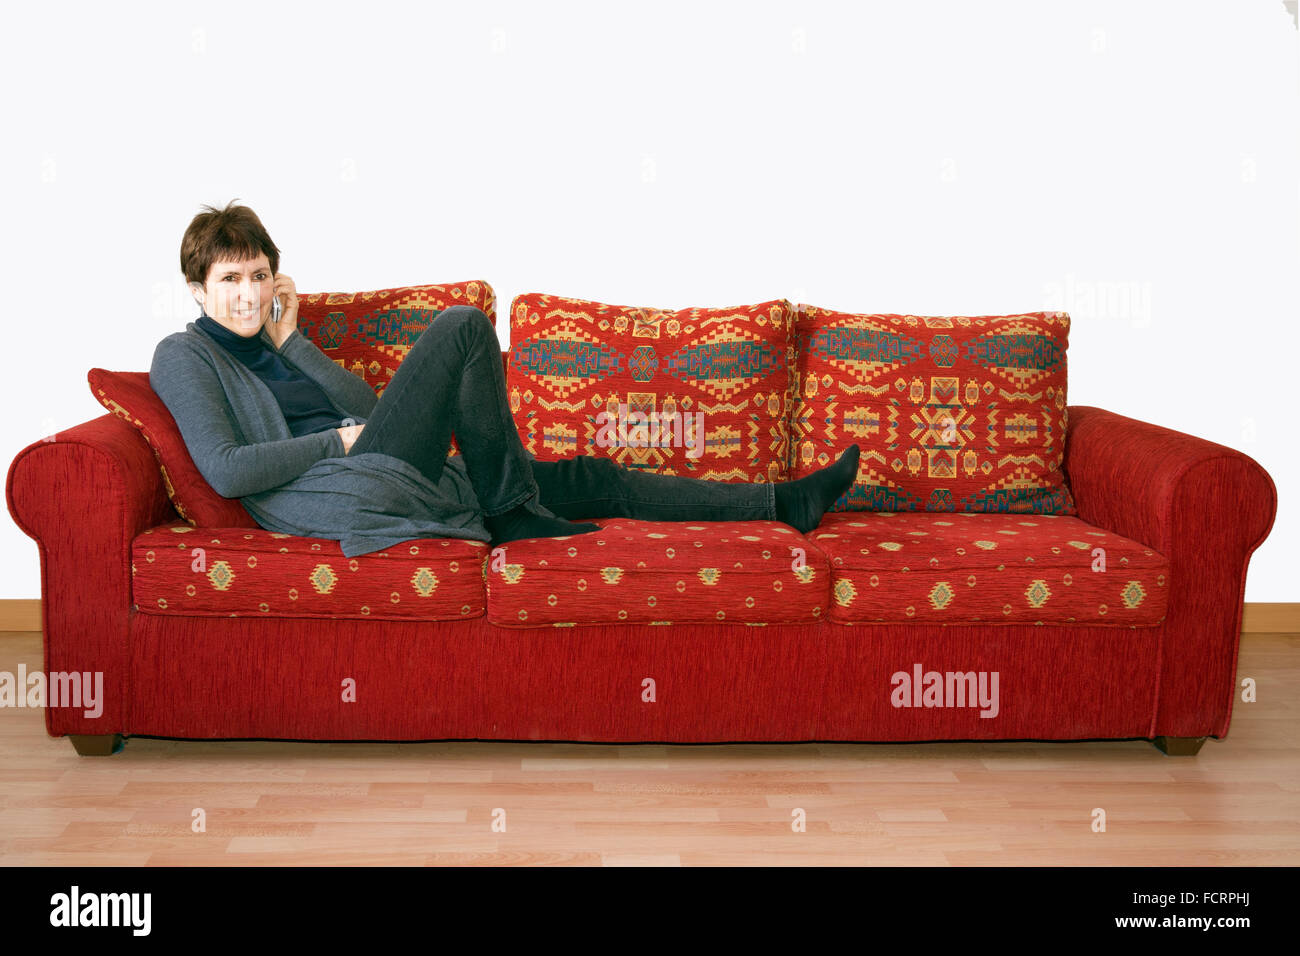 Older woman gossiping on phone, on sofa. - Stock Image